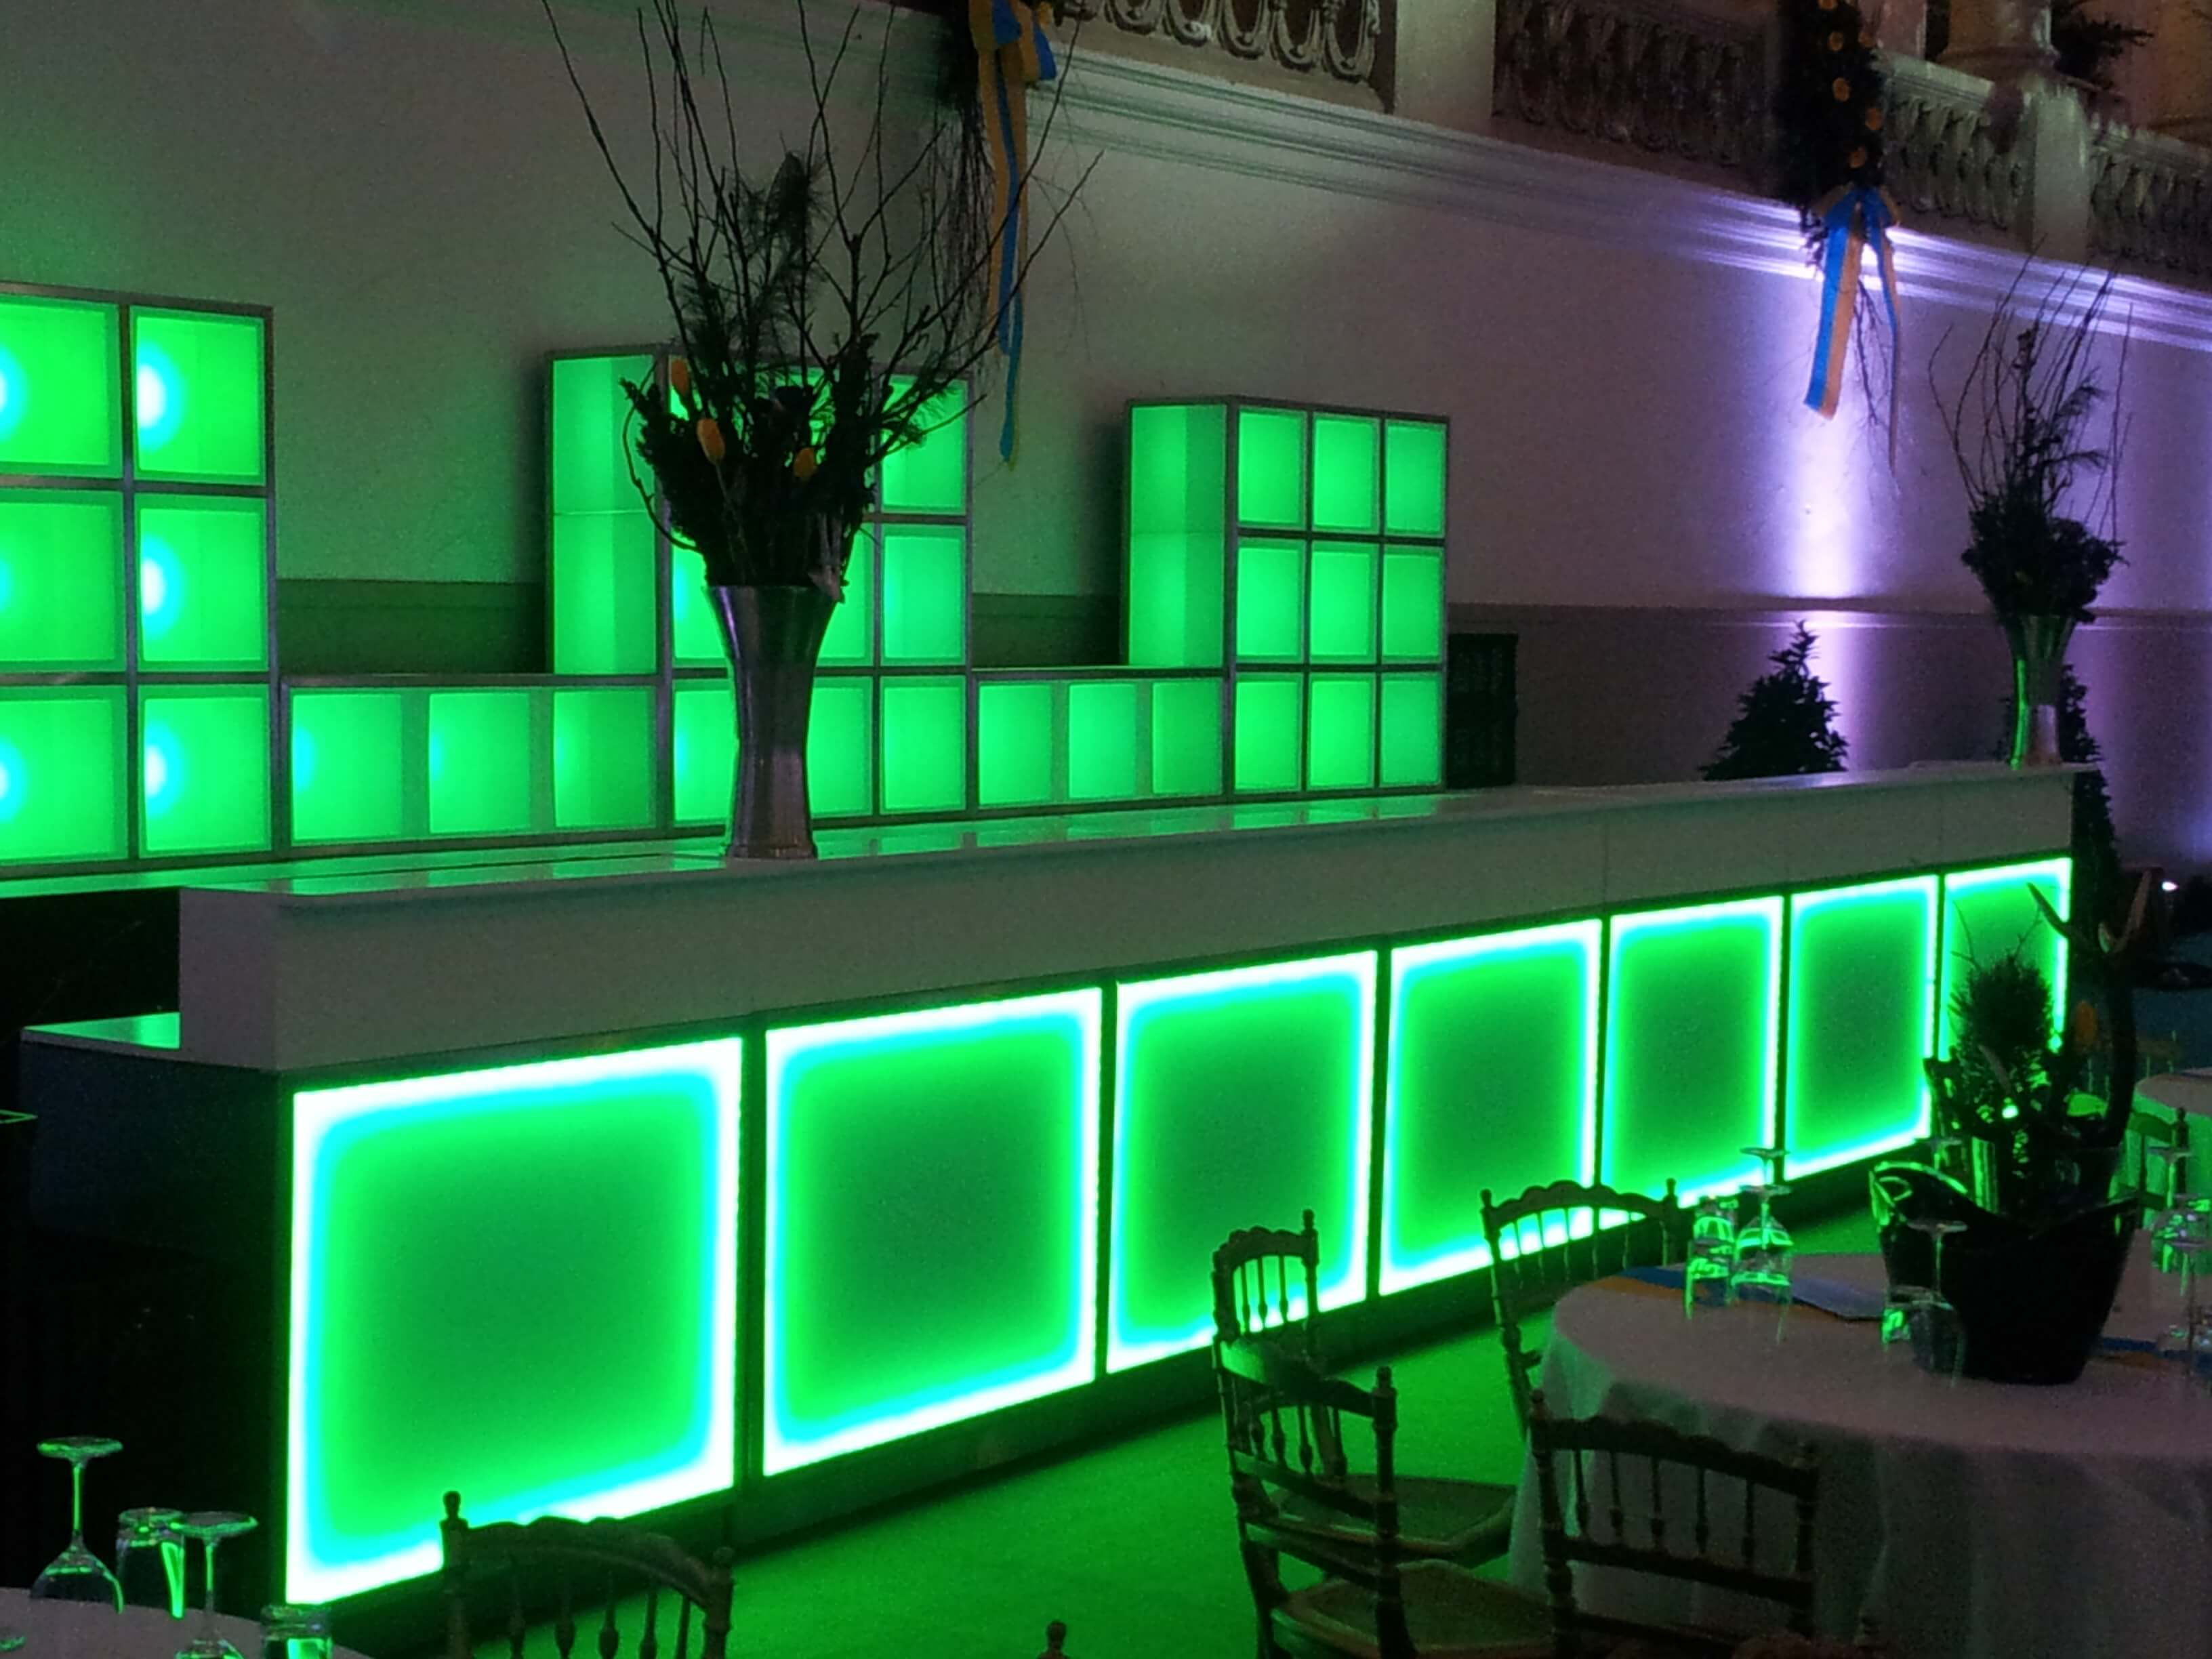 Bar beleuchtet mieten Wien Österreich